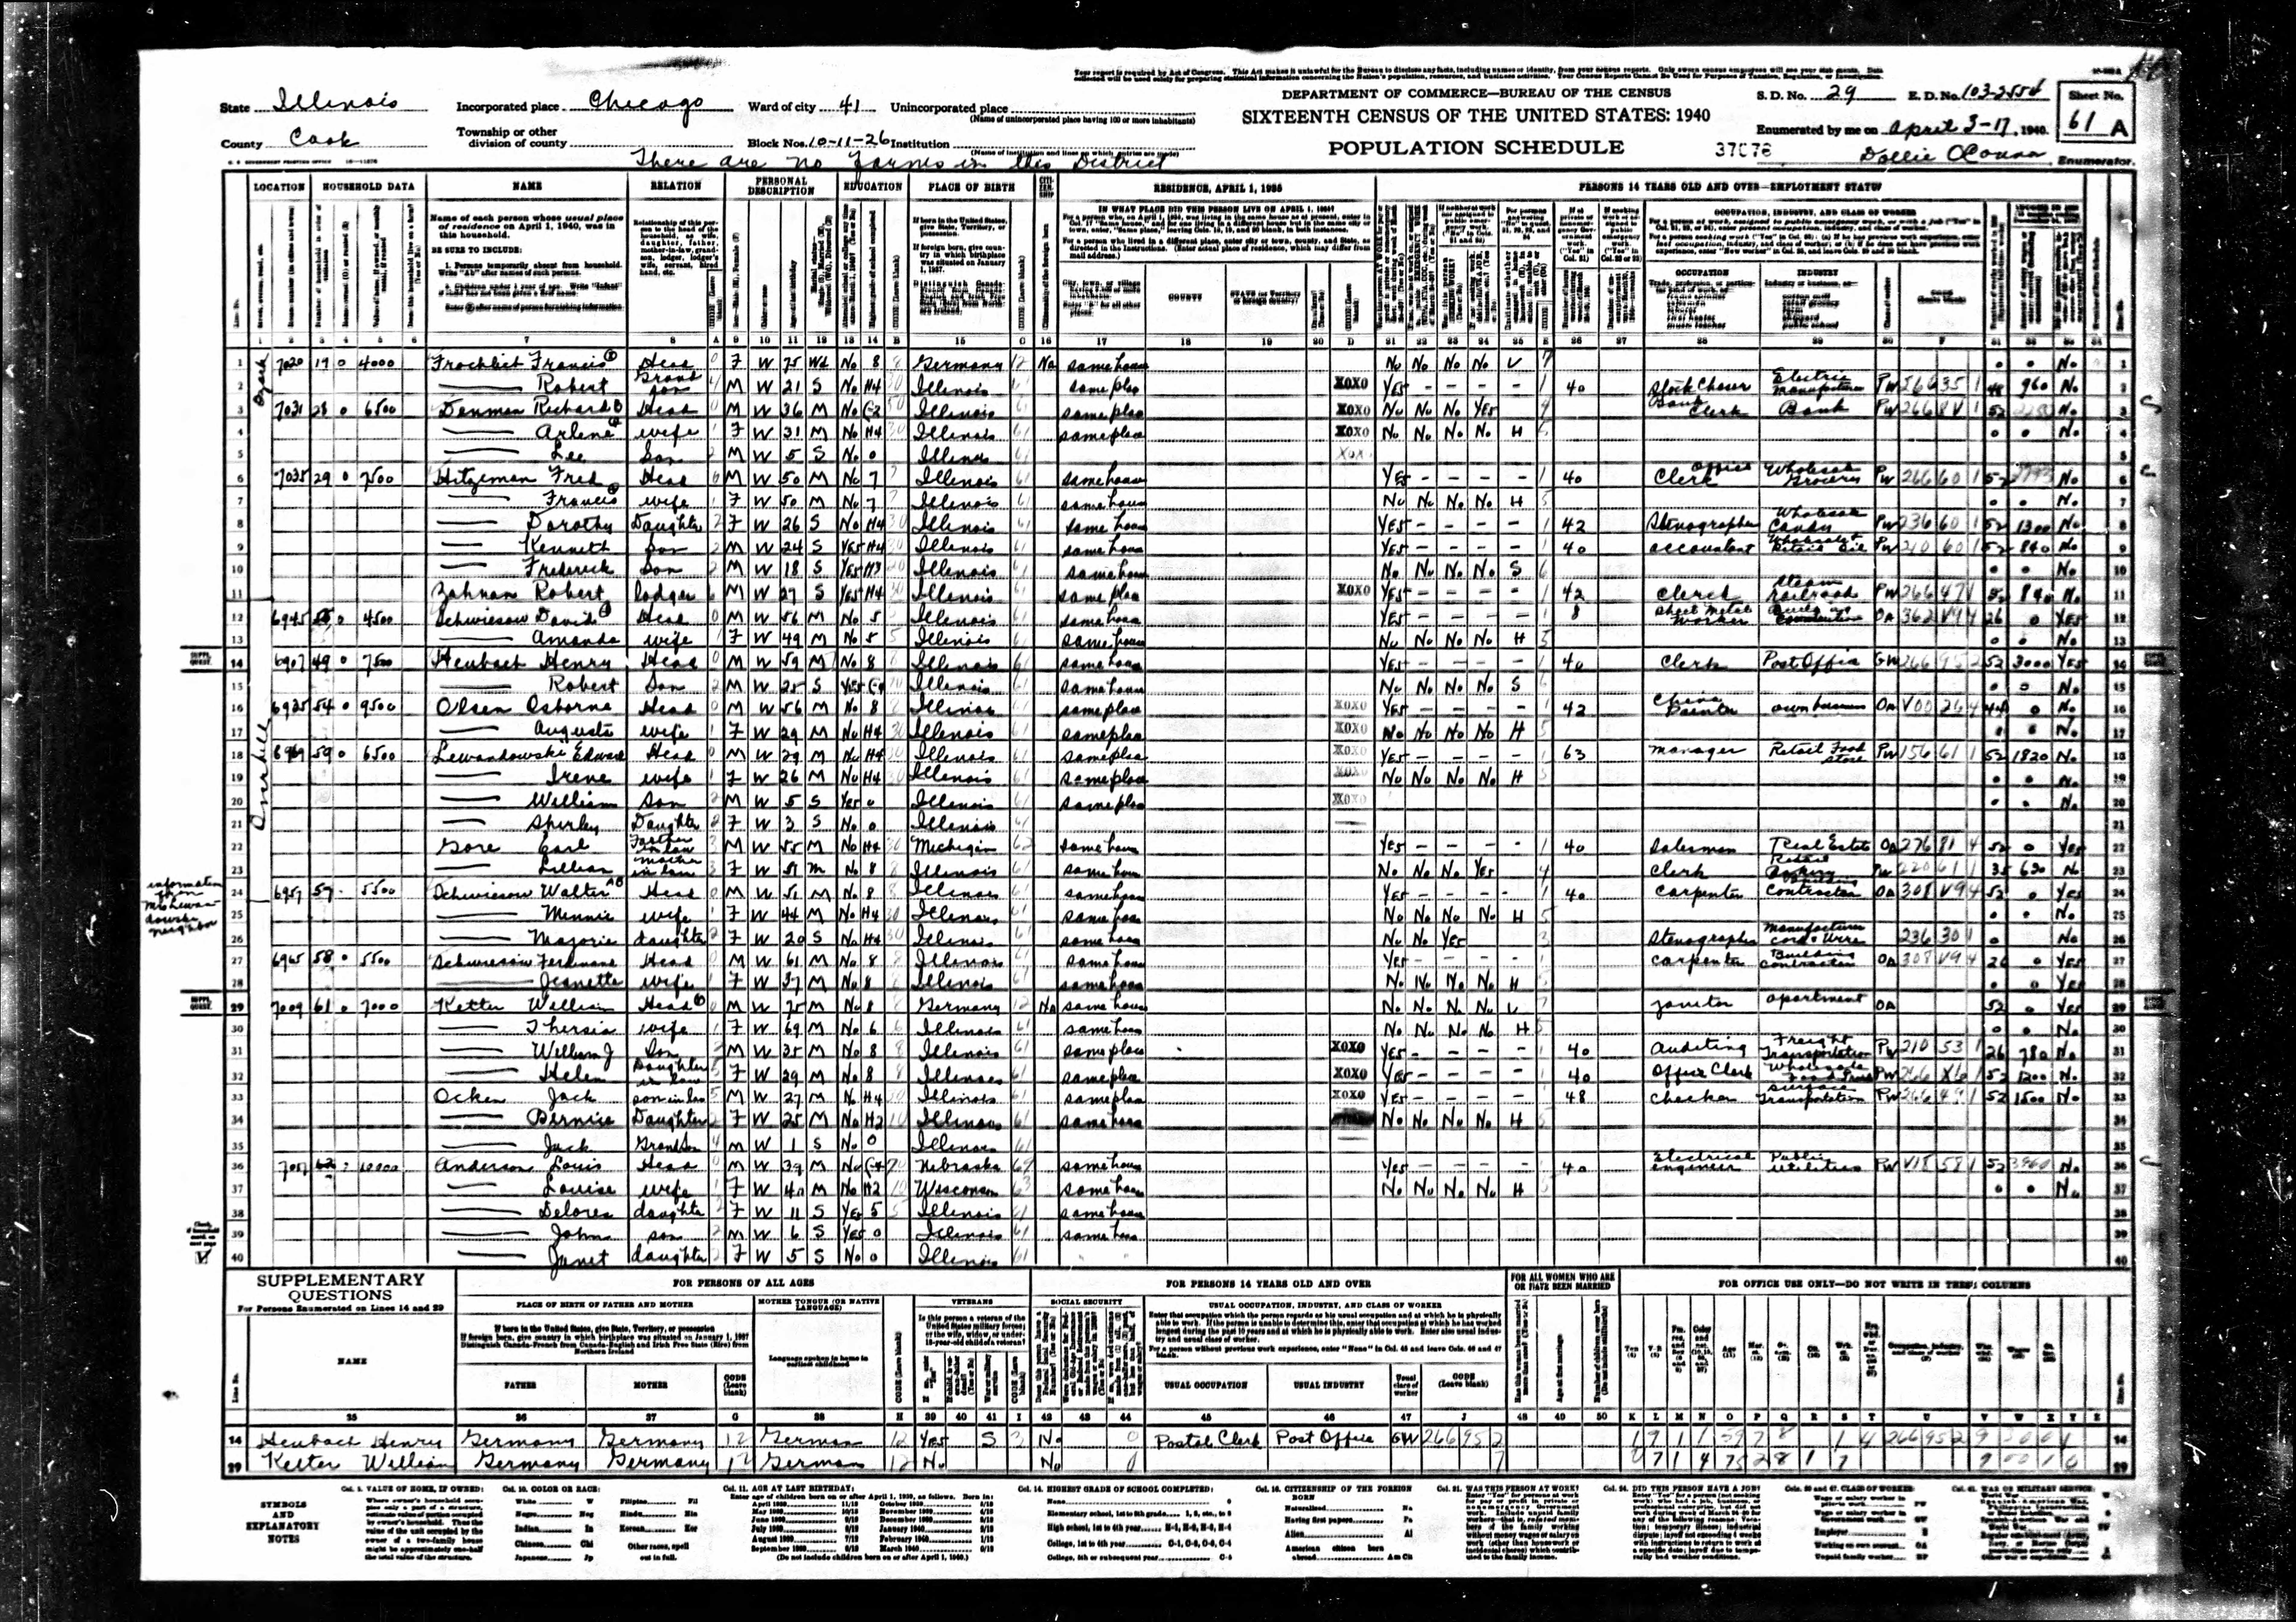 Osborne theomun olsen wikipedia 1940 us census with osborne living in chicago illinois malvernweather Gallery